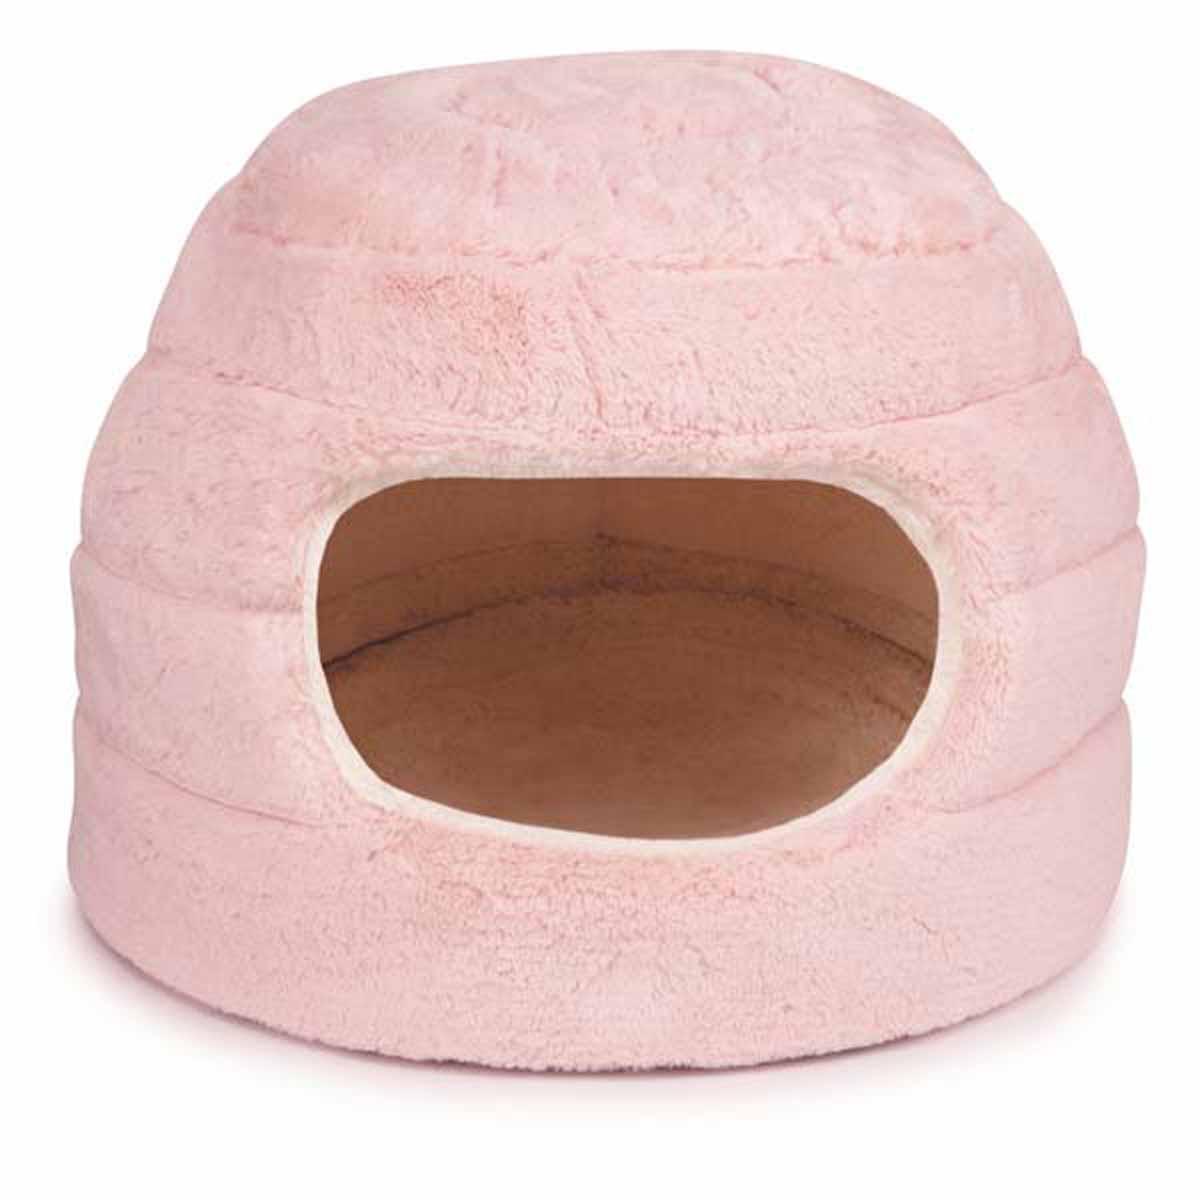 Slumber Pet Cuddler Dog Bed - Pink